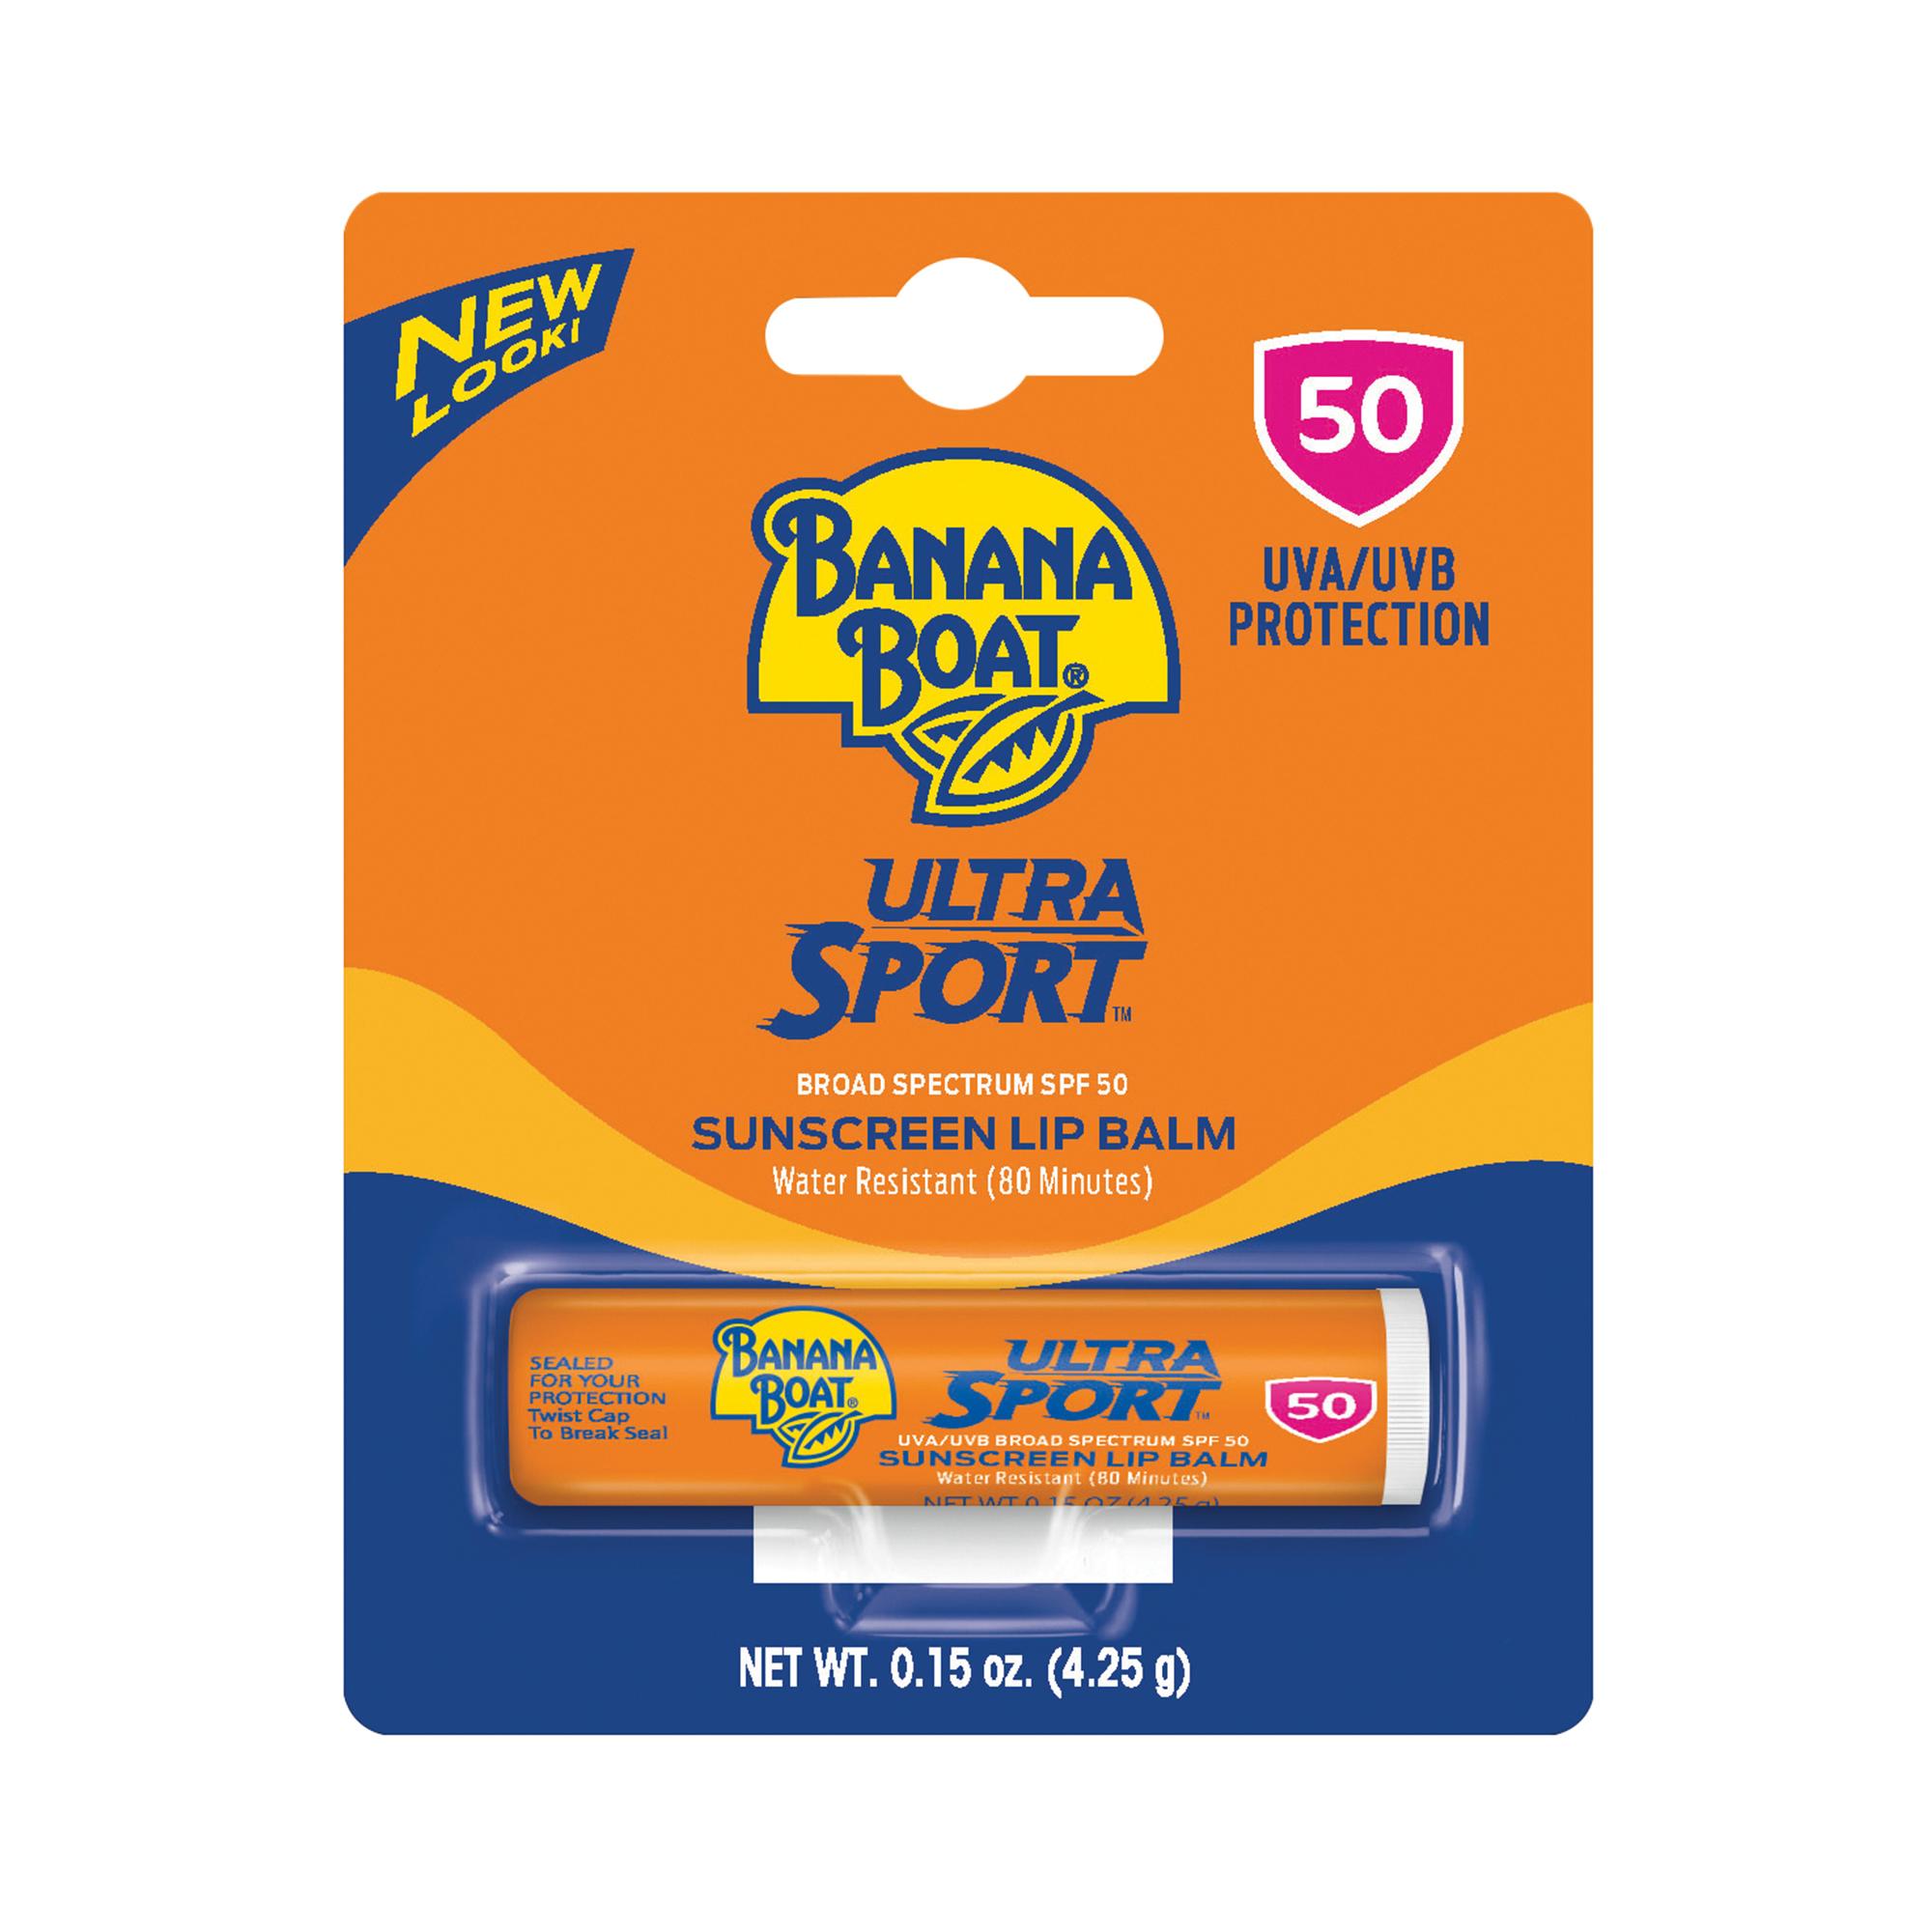 Banana Boat Ultra Sport Sunscreen Lip Balm SPF 50, 0.15 Oz, Packaging May Vary